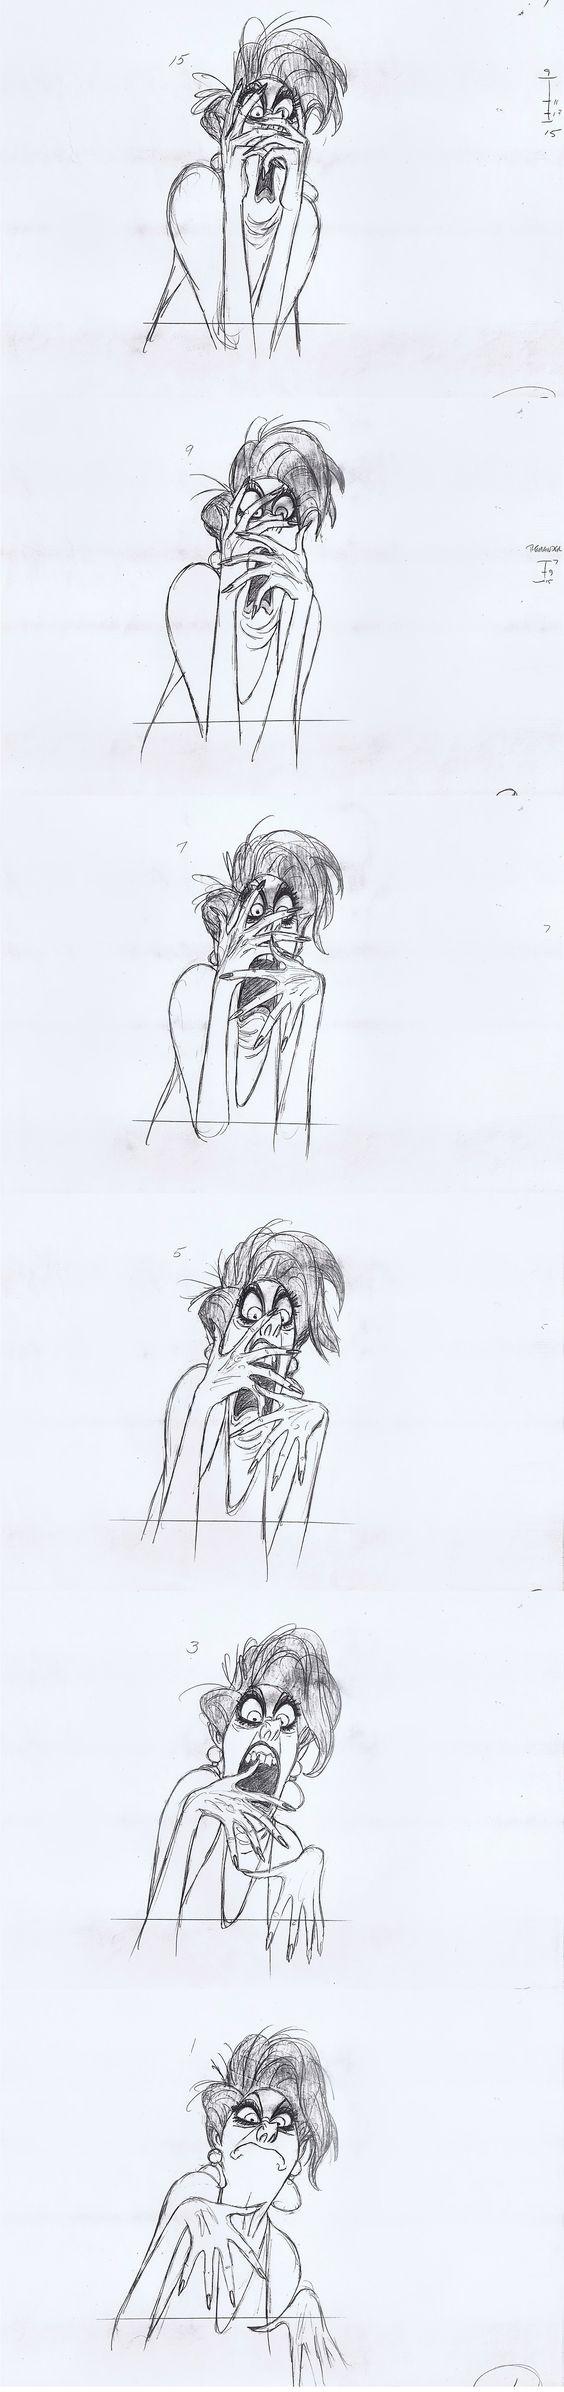 Milt Kahl - Medusa Rough Animation: